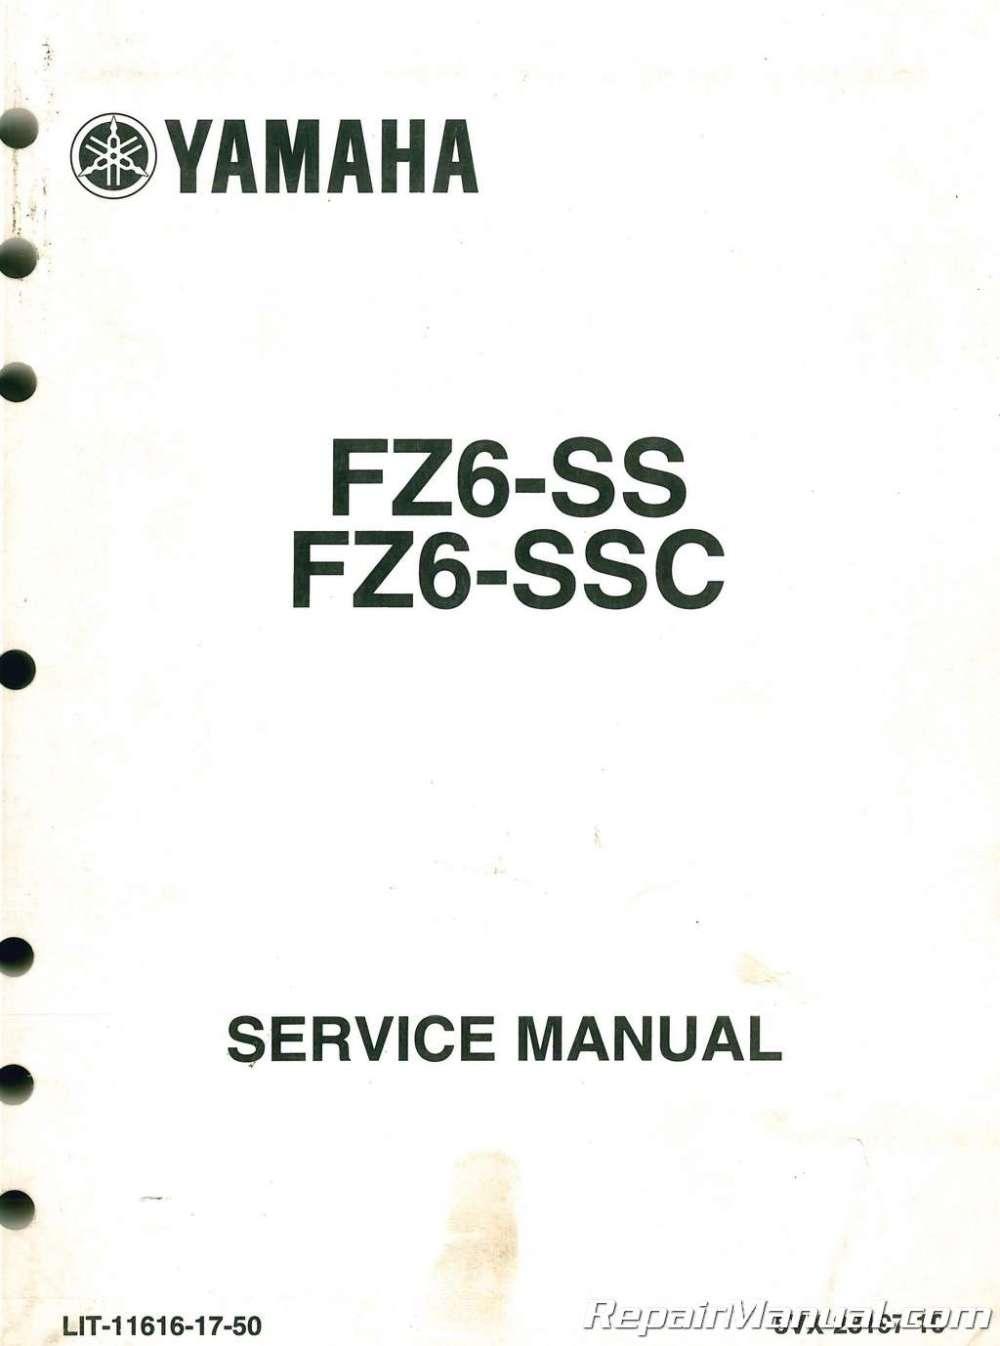 medium resolution of used 2004 2006 yamaha fz6 motorcycle service manual